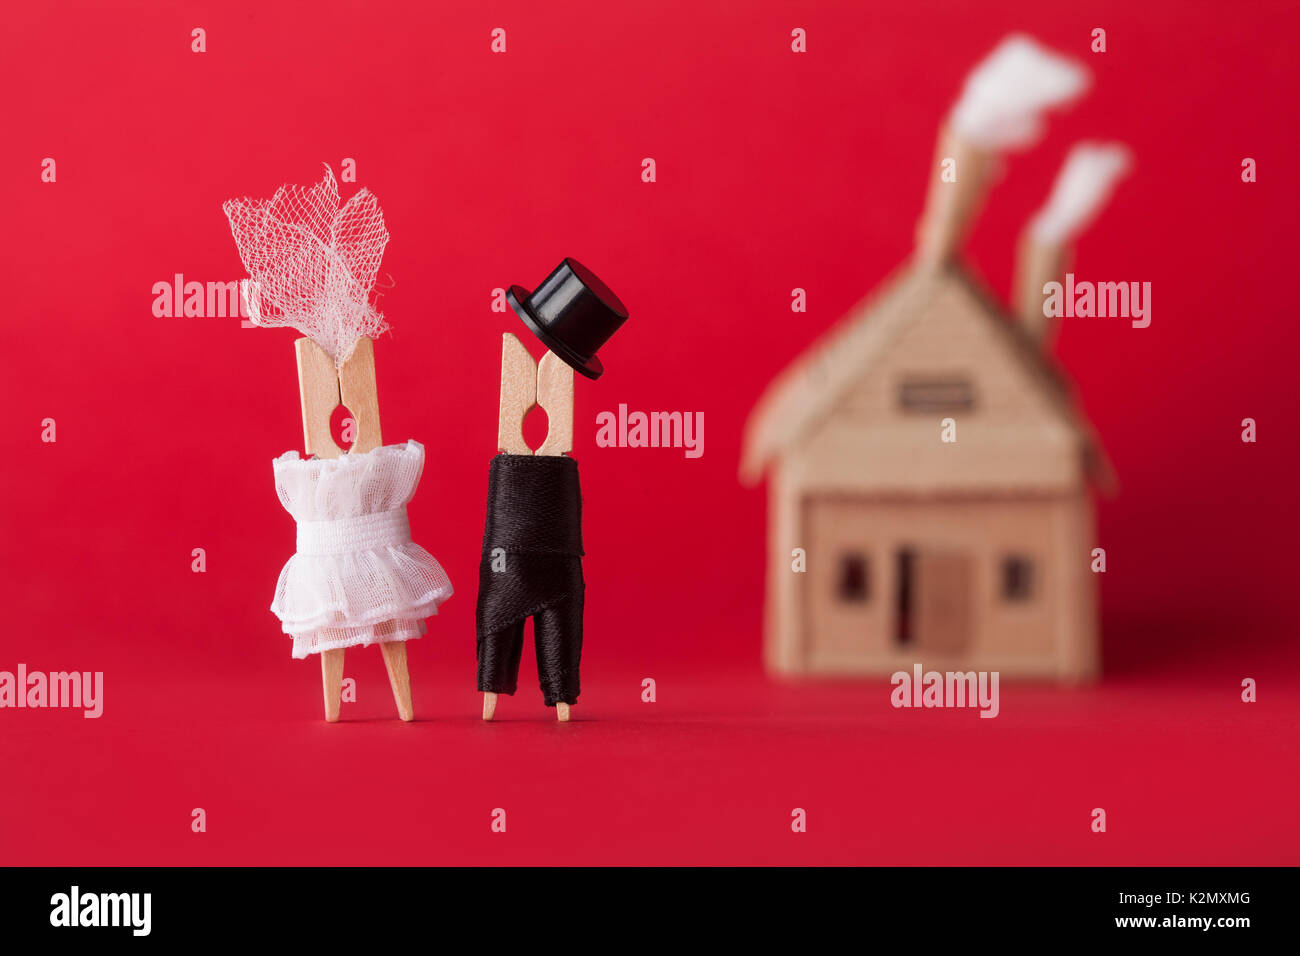 Wedding Invitation Template Stock Photos & Wedding Invitation ...